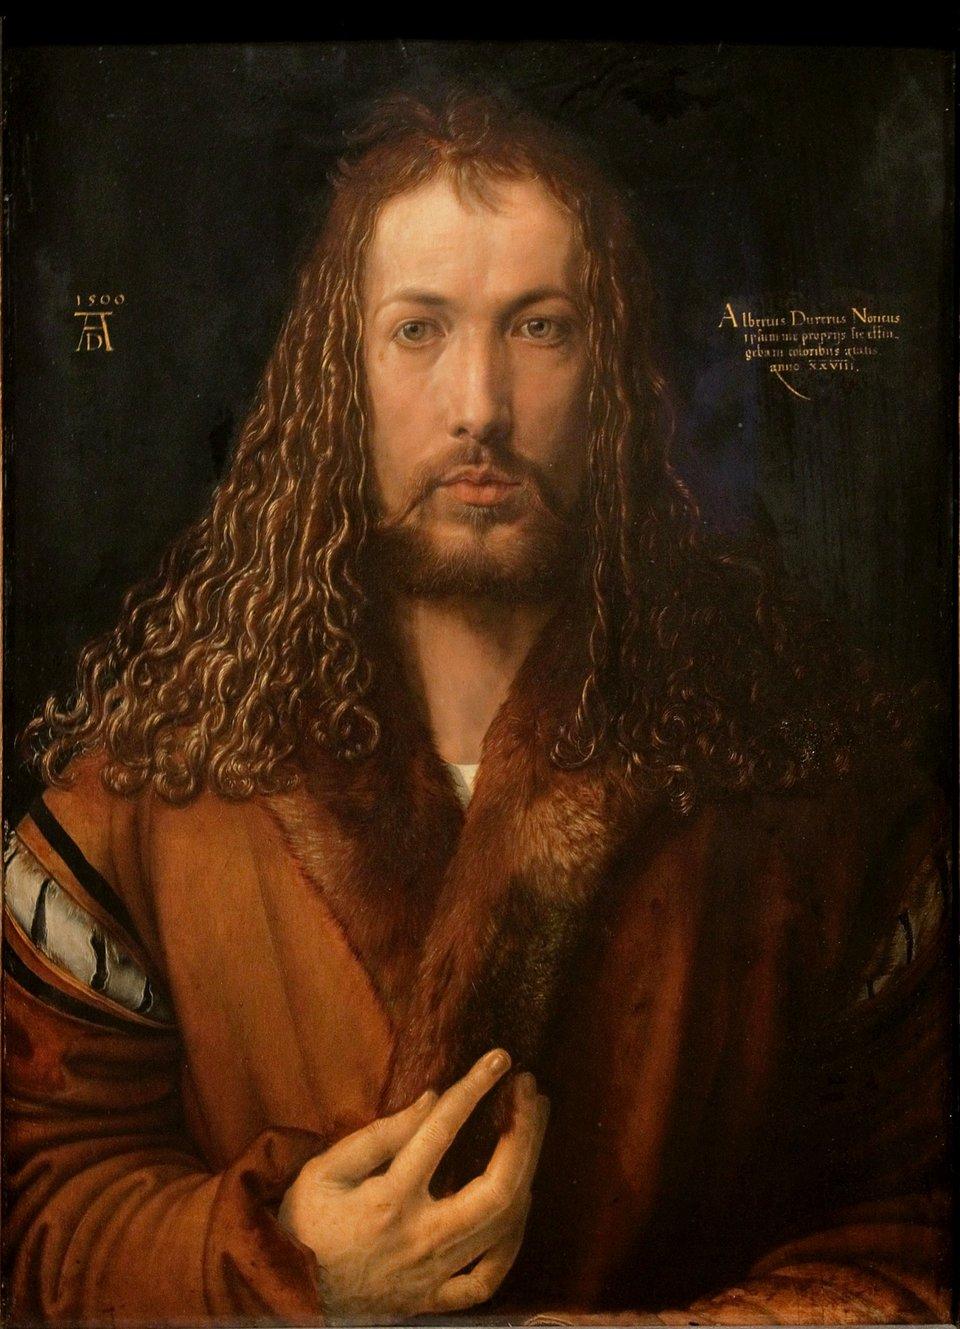 Autoportret Źródło: Albrecht Dürer, Autoportret, 1500, olej na desce, Stara Pinakoteka wMonachium, domena publiczna.